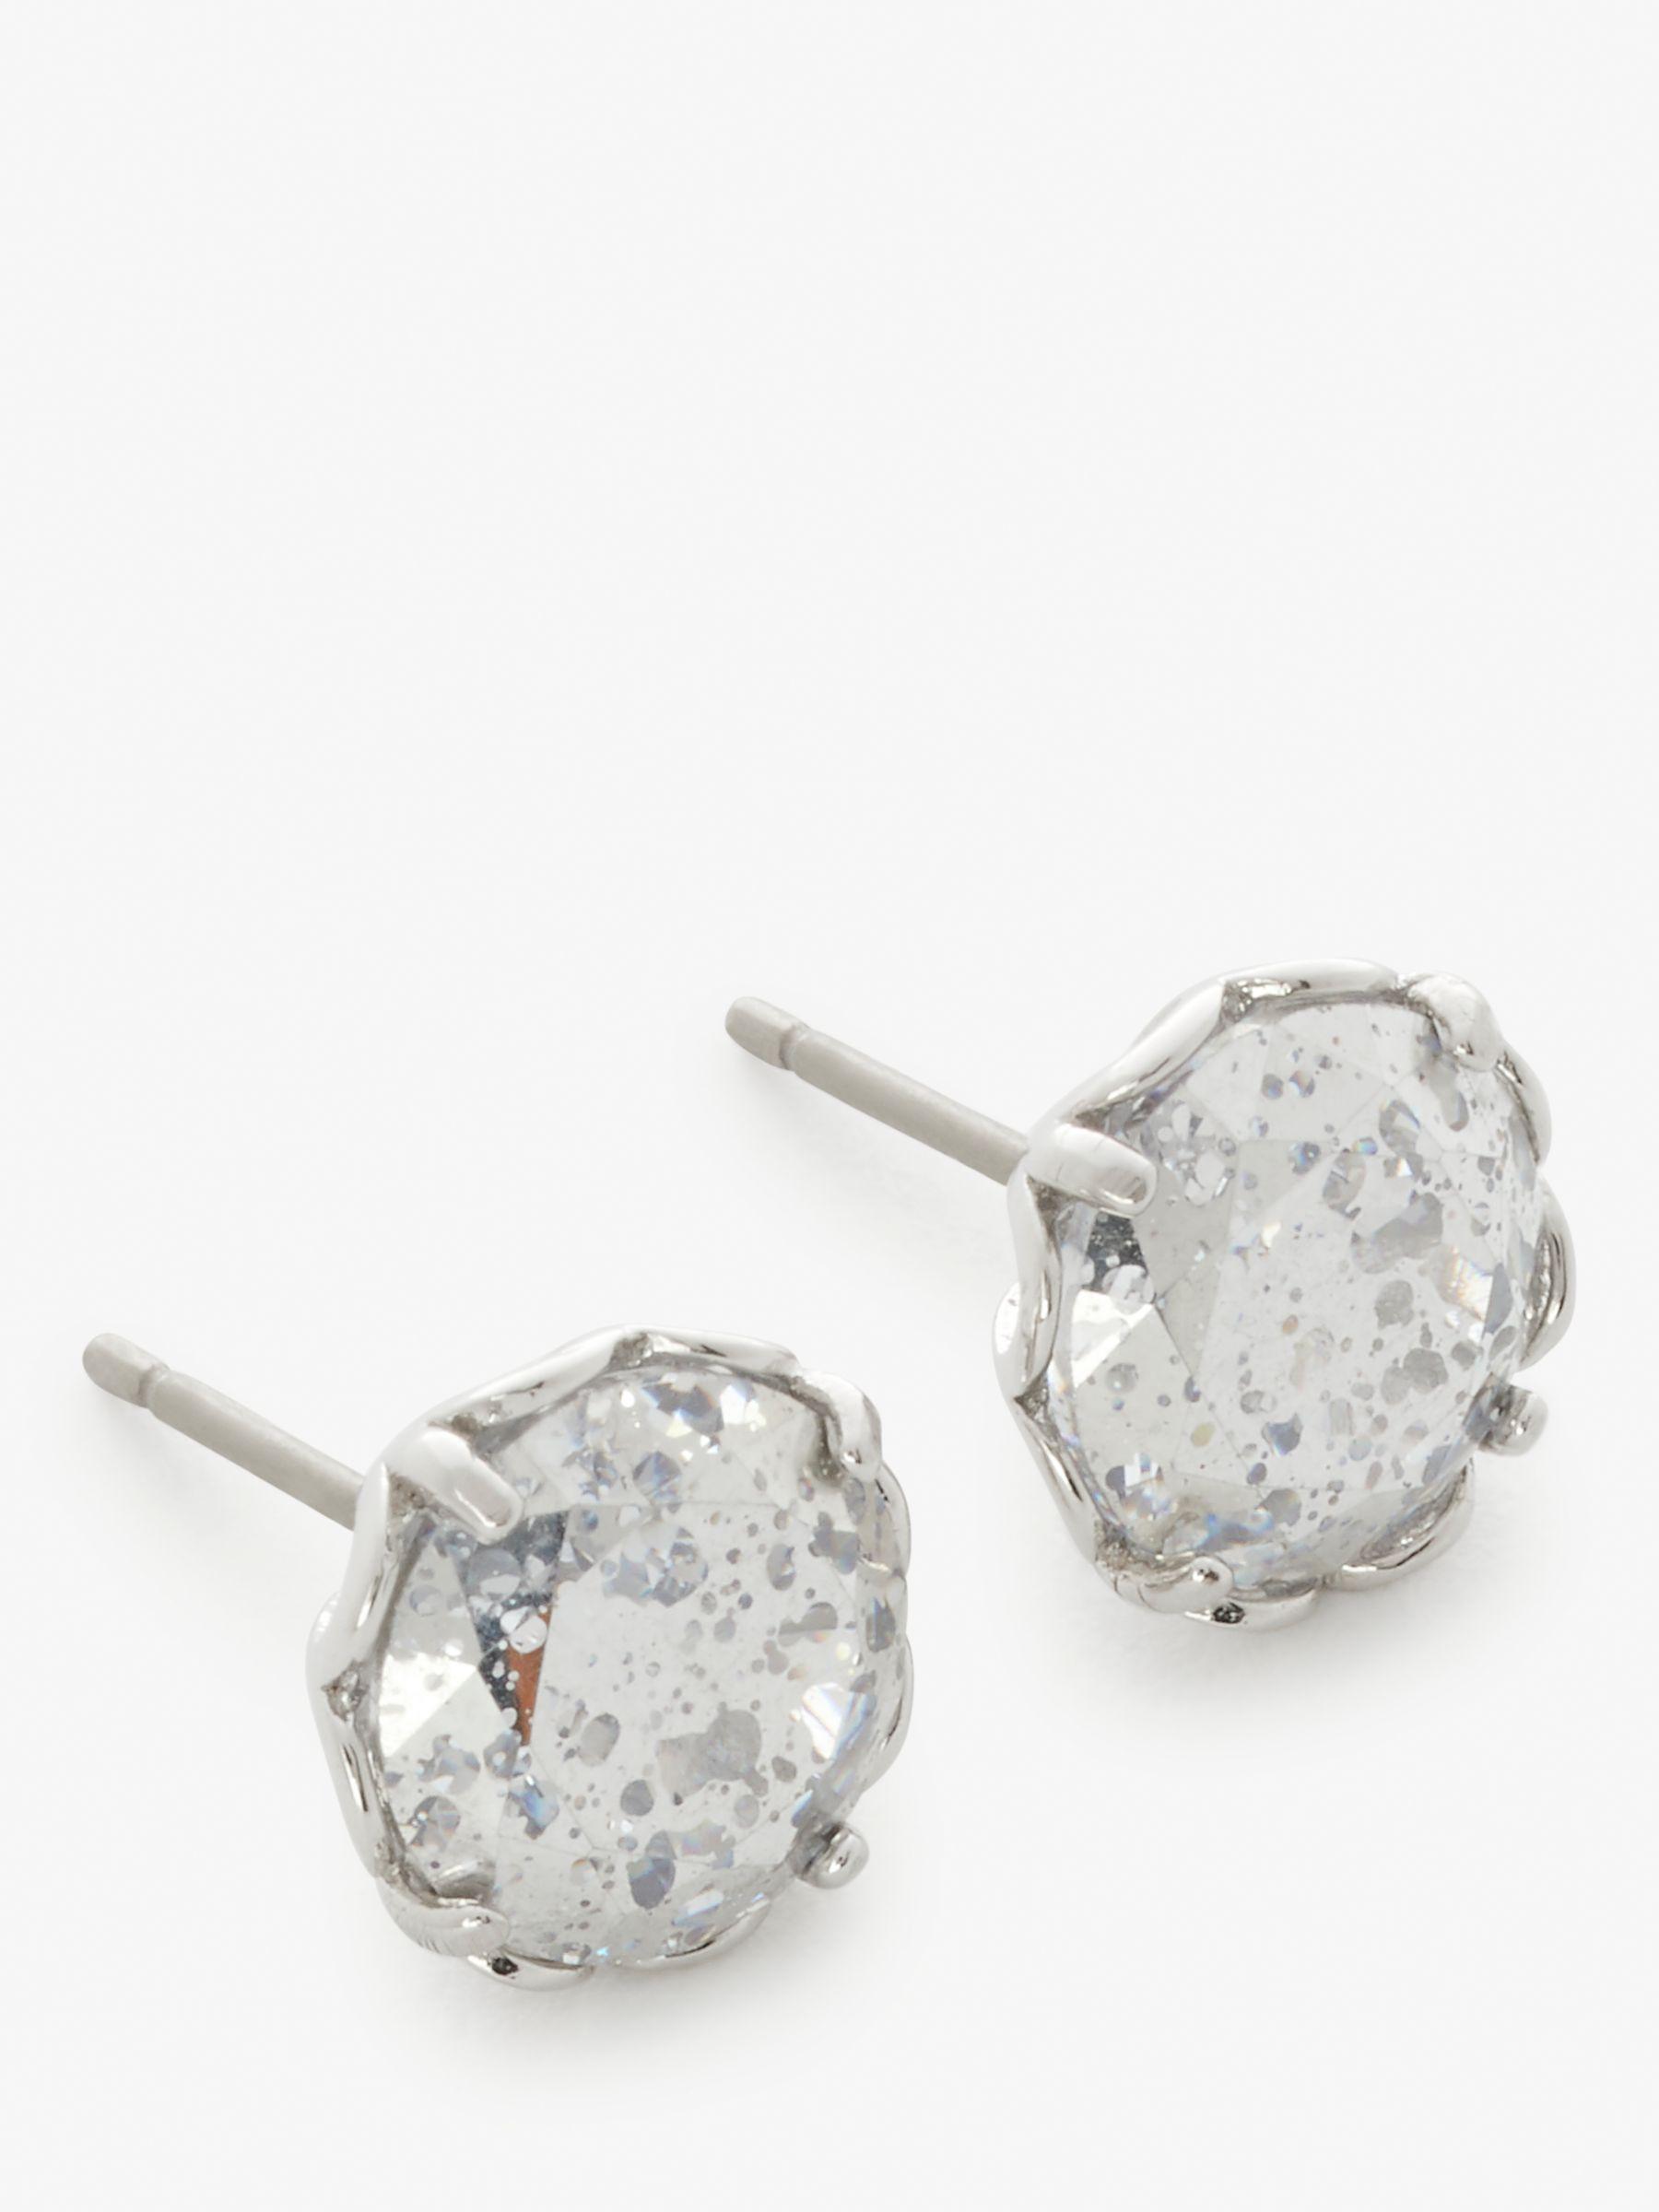 Kate Spade New York Cubic Zirconia Stud Earrings Silver Clear